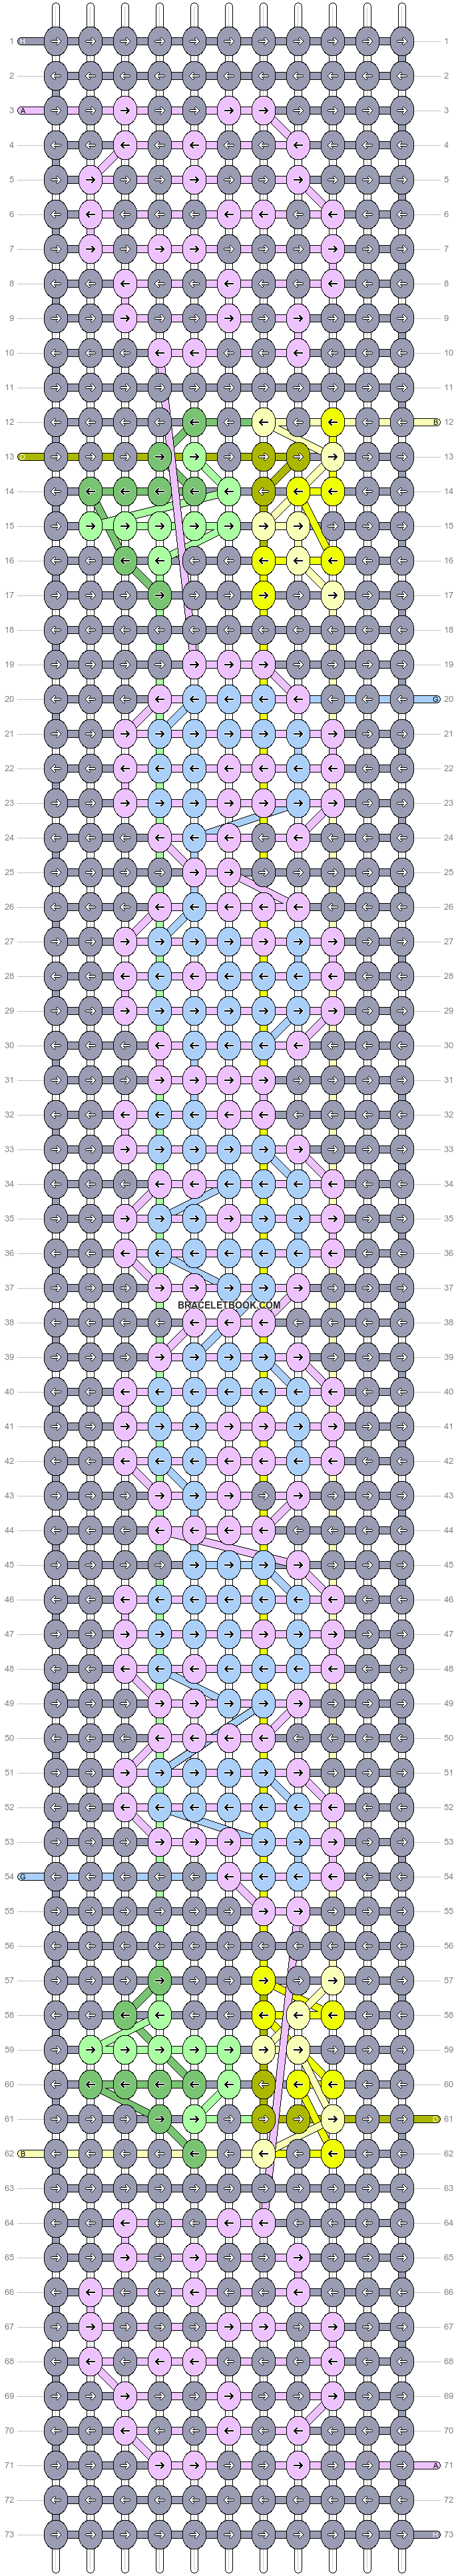 Alpha pattern #89304 pattern